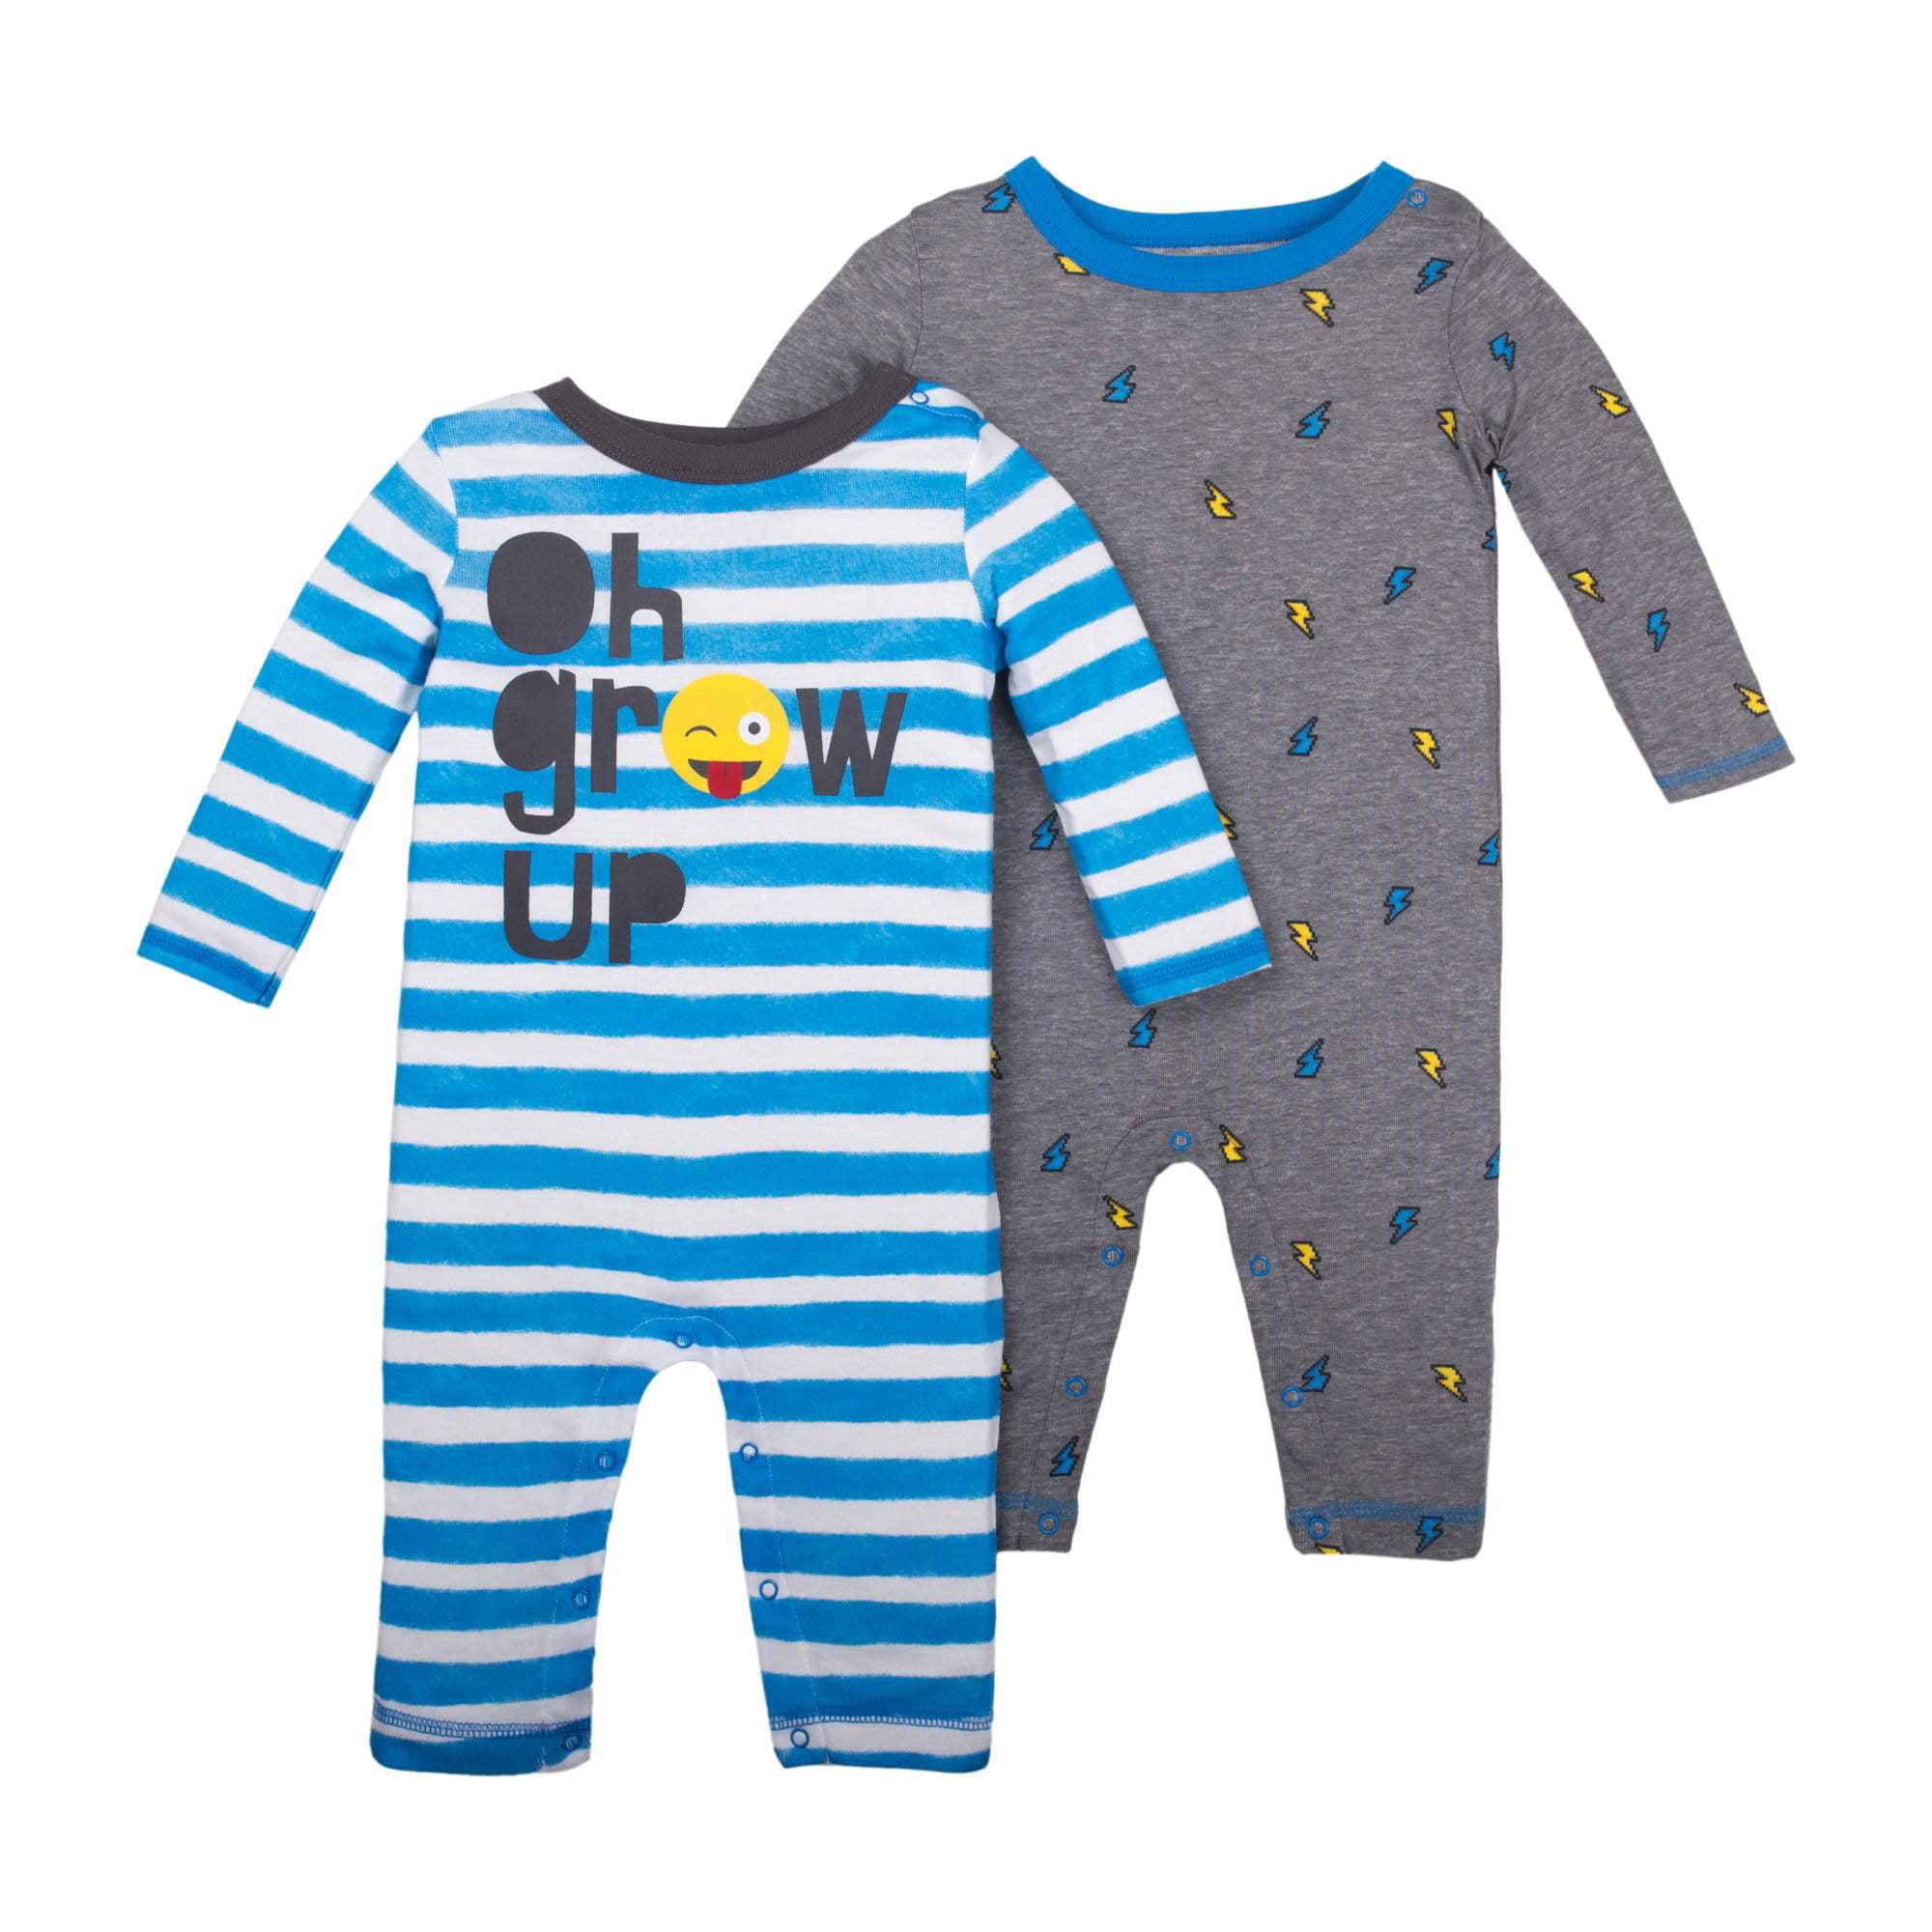 6012f3bccd78 Little Star Organic - Newborn Baby Boy Long Sleeve One Piece Romper ...